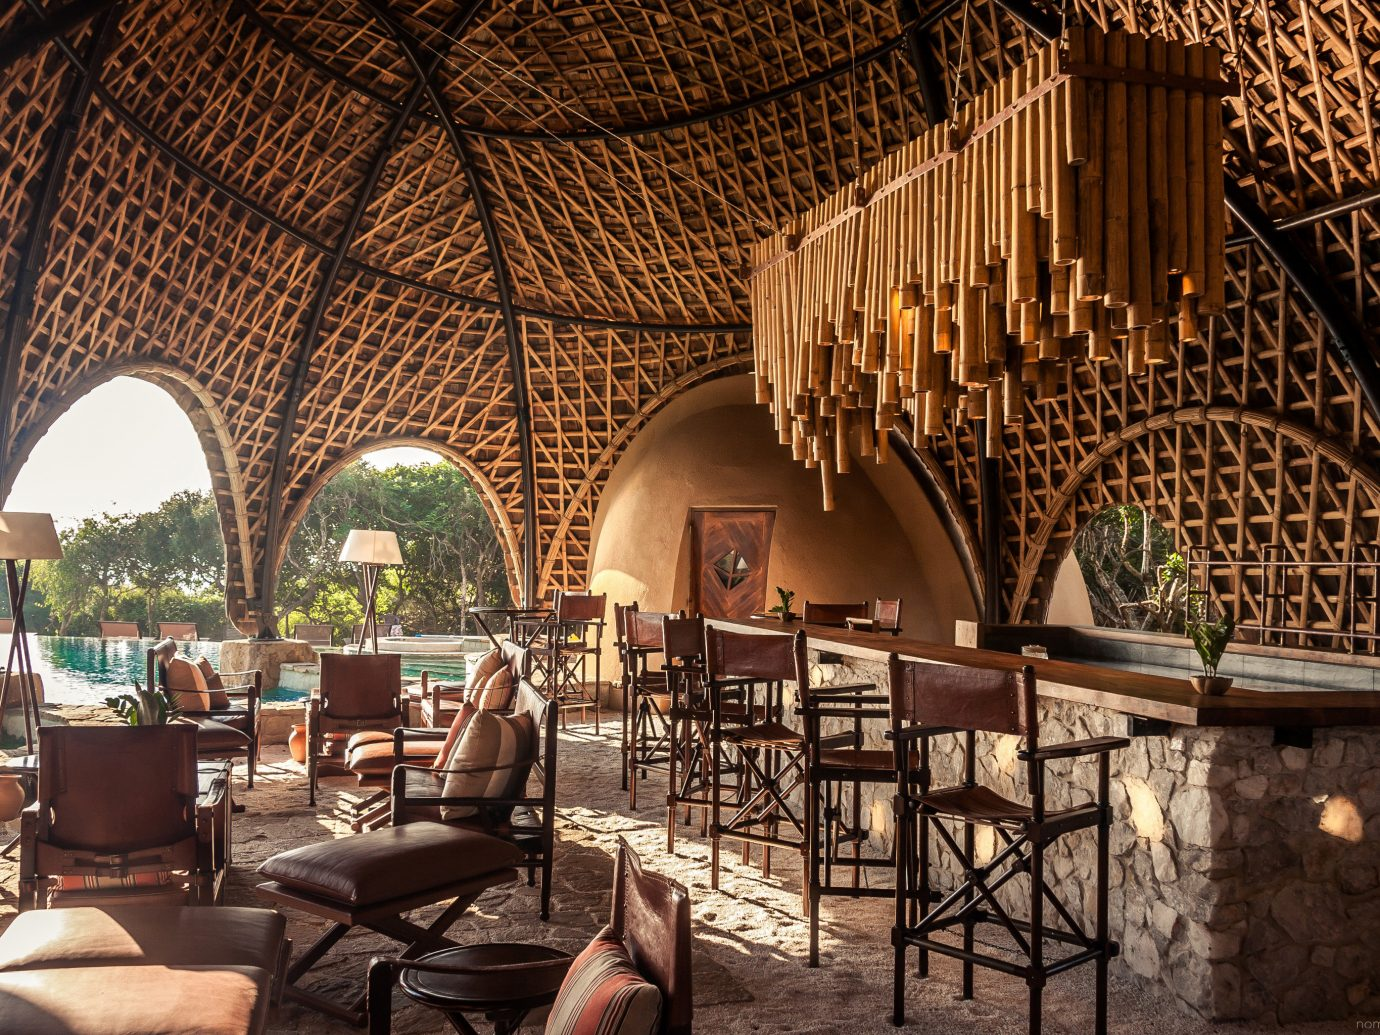 Hotels Outdoors + Adventure restaurant interior design